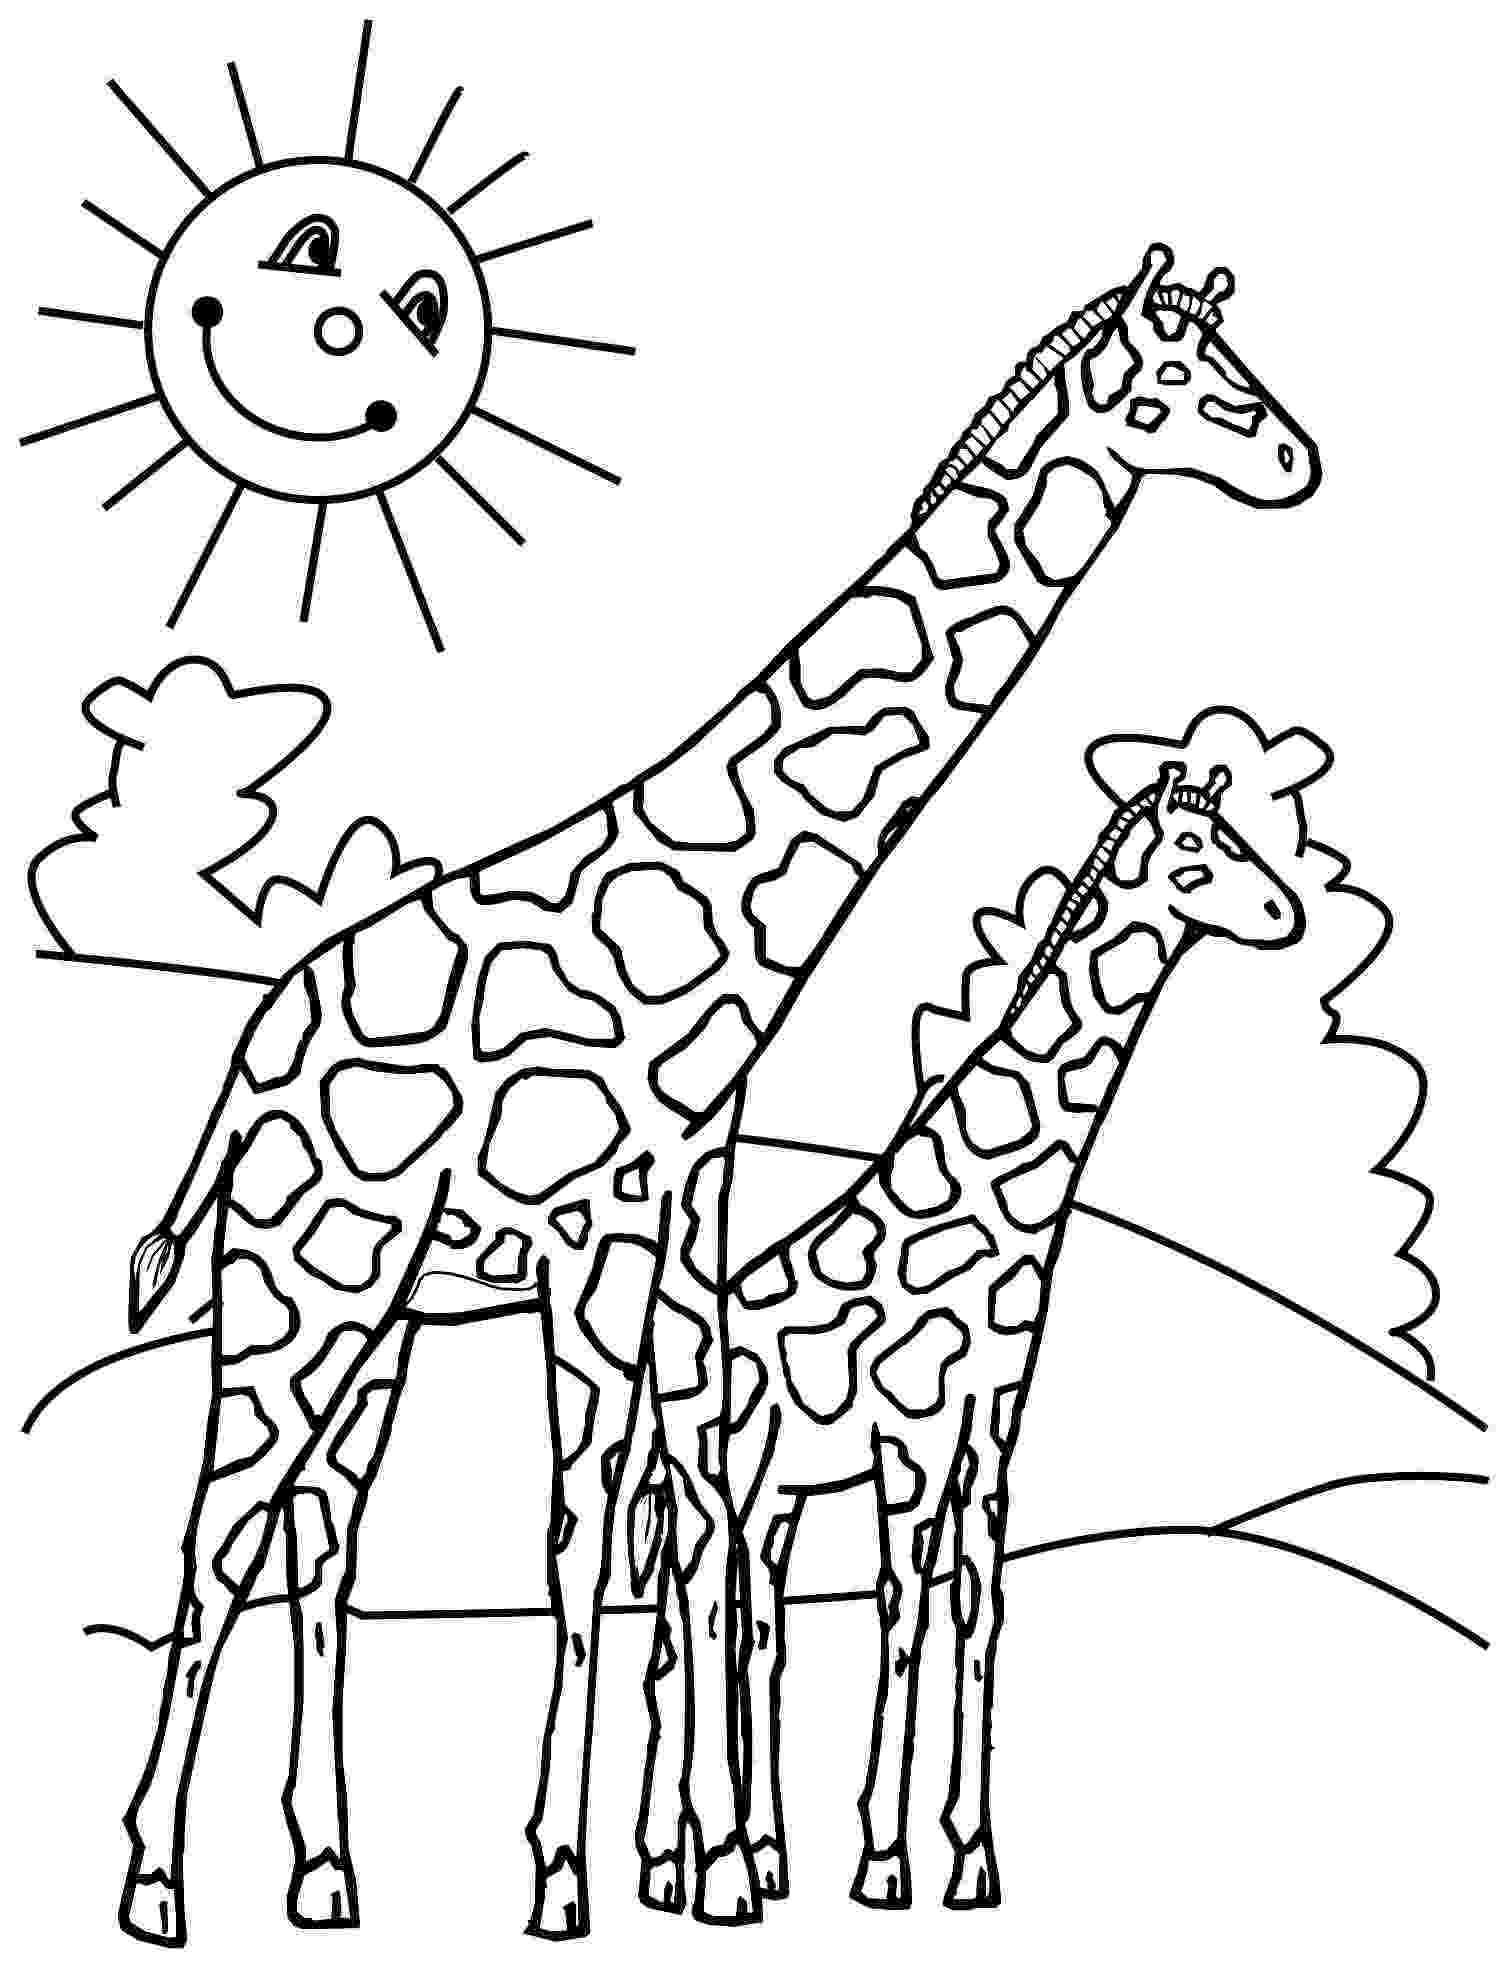 colouring sheet giraffe giraffe coloring pages coloring pages to print sheet colouring giraffe